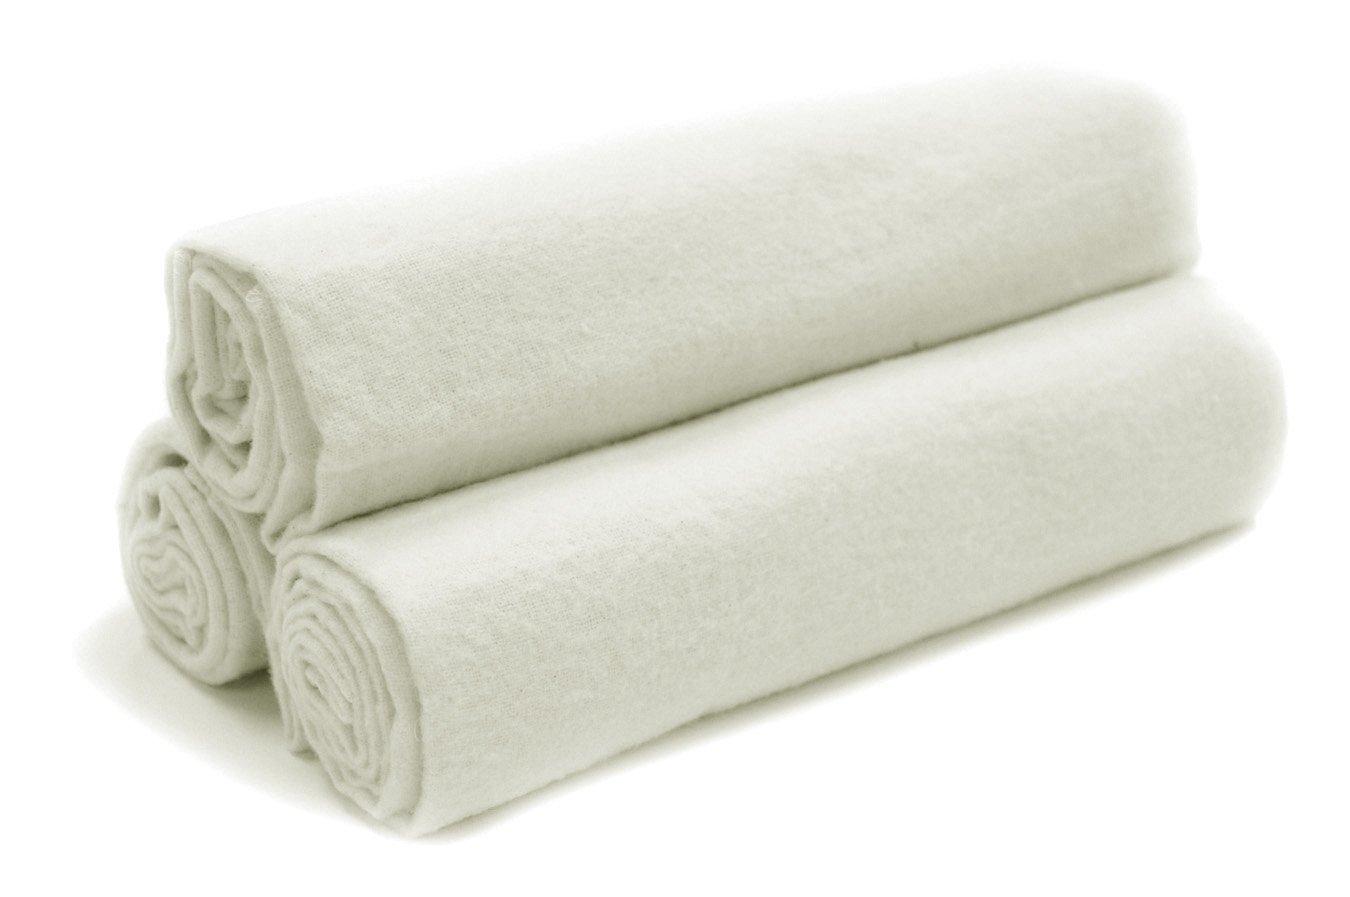 Tadpoles Organics Set of 3 Flannel Receiving Blankets, White Sleeping Partners brbboc009